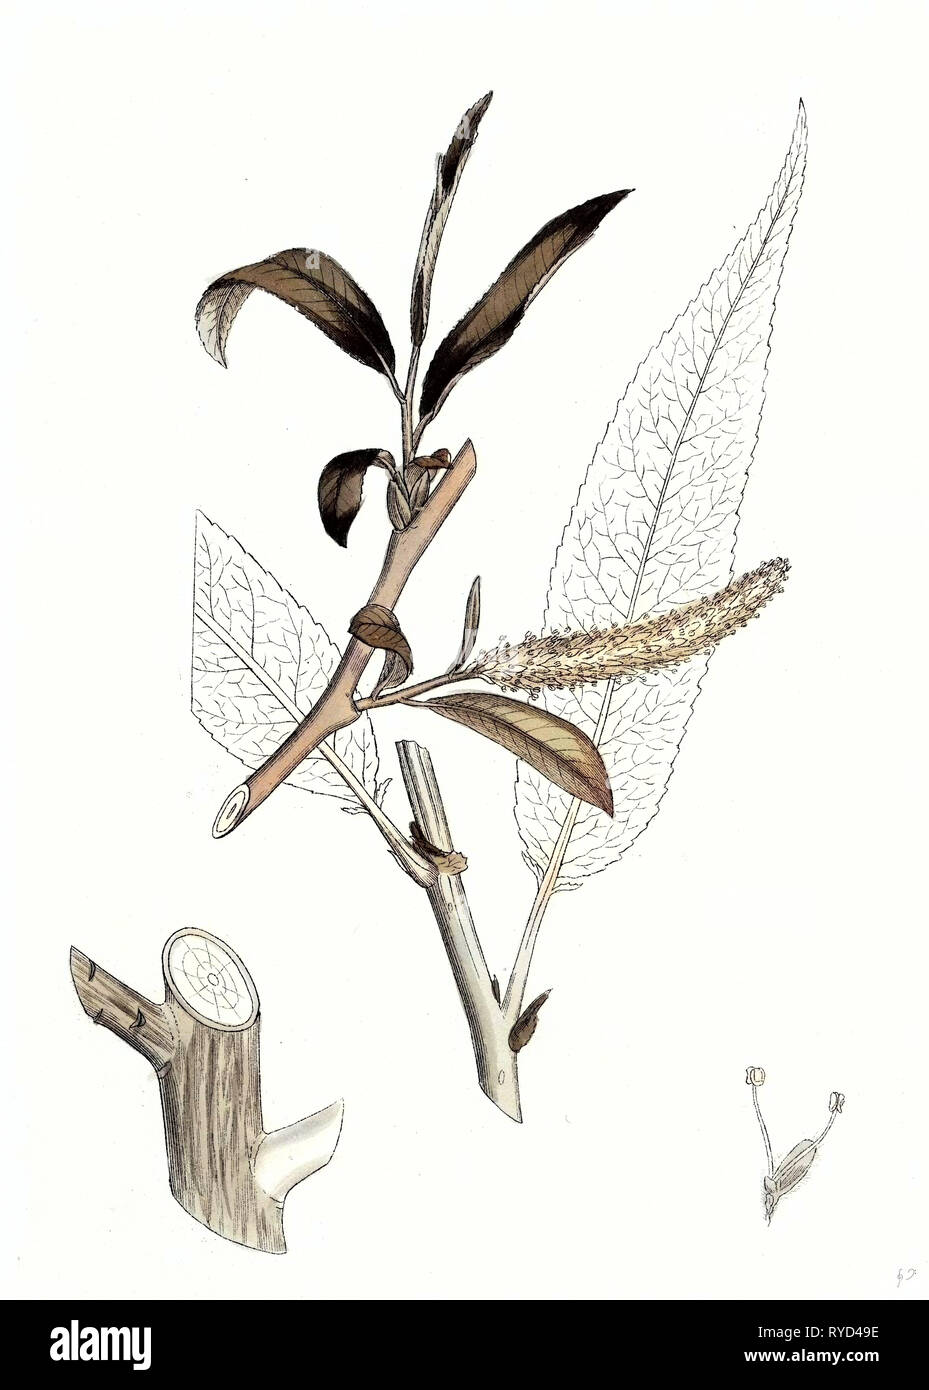 Salix Fragilis Var. Decipiens White Welsh Willow - Stock Image